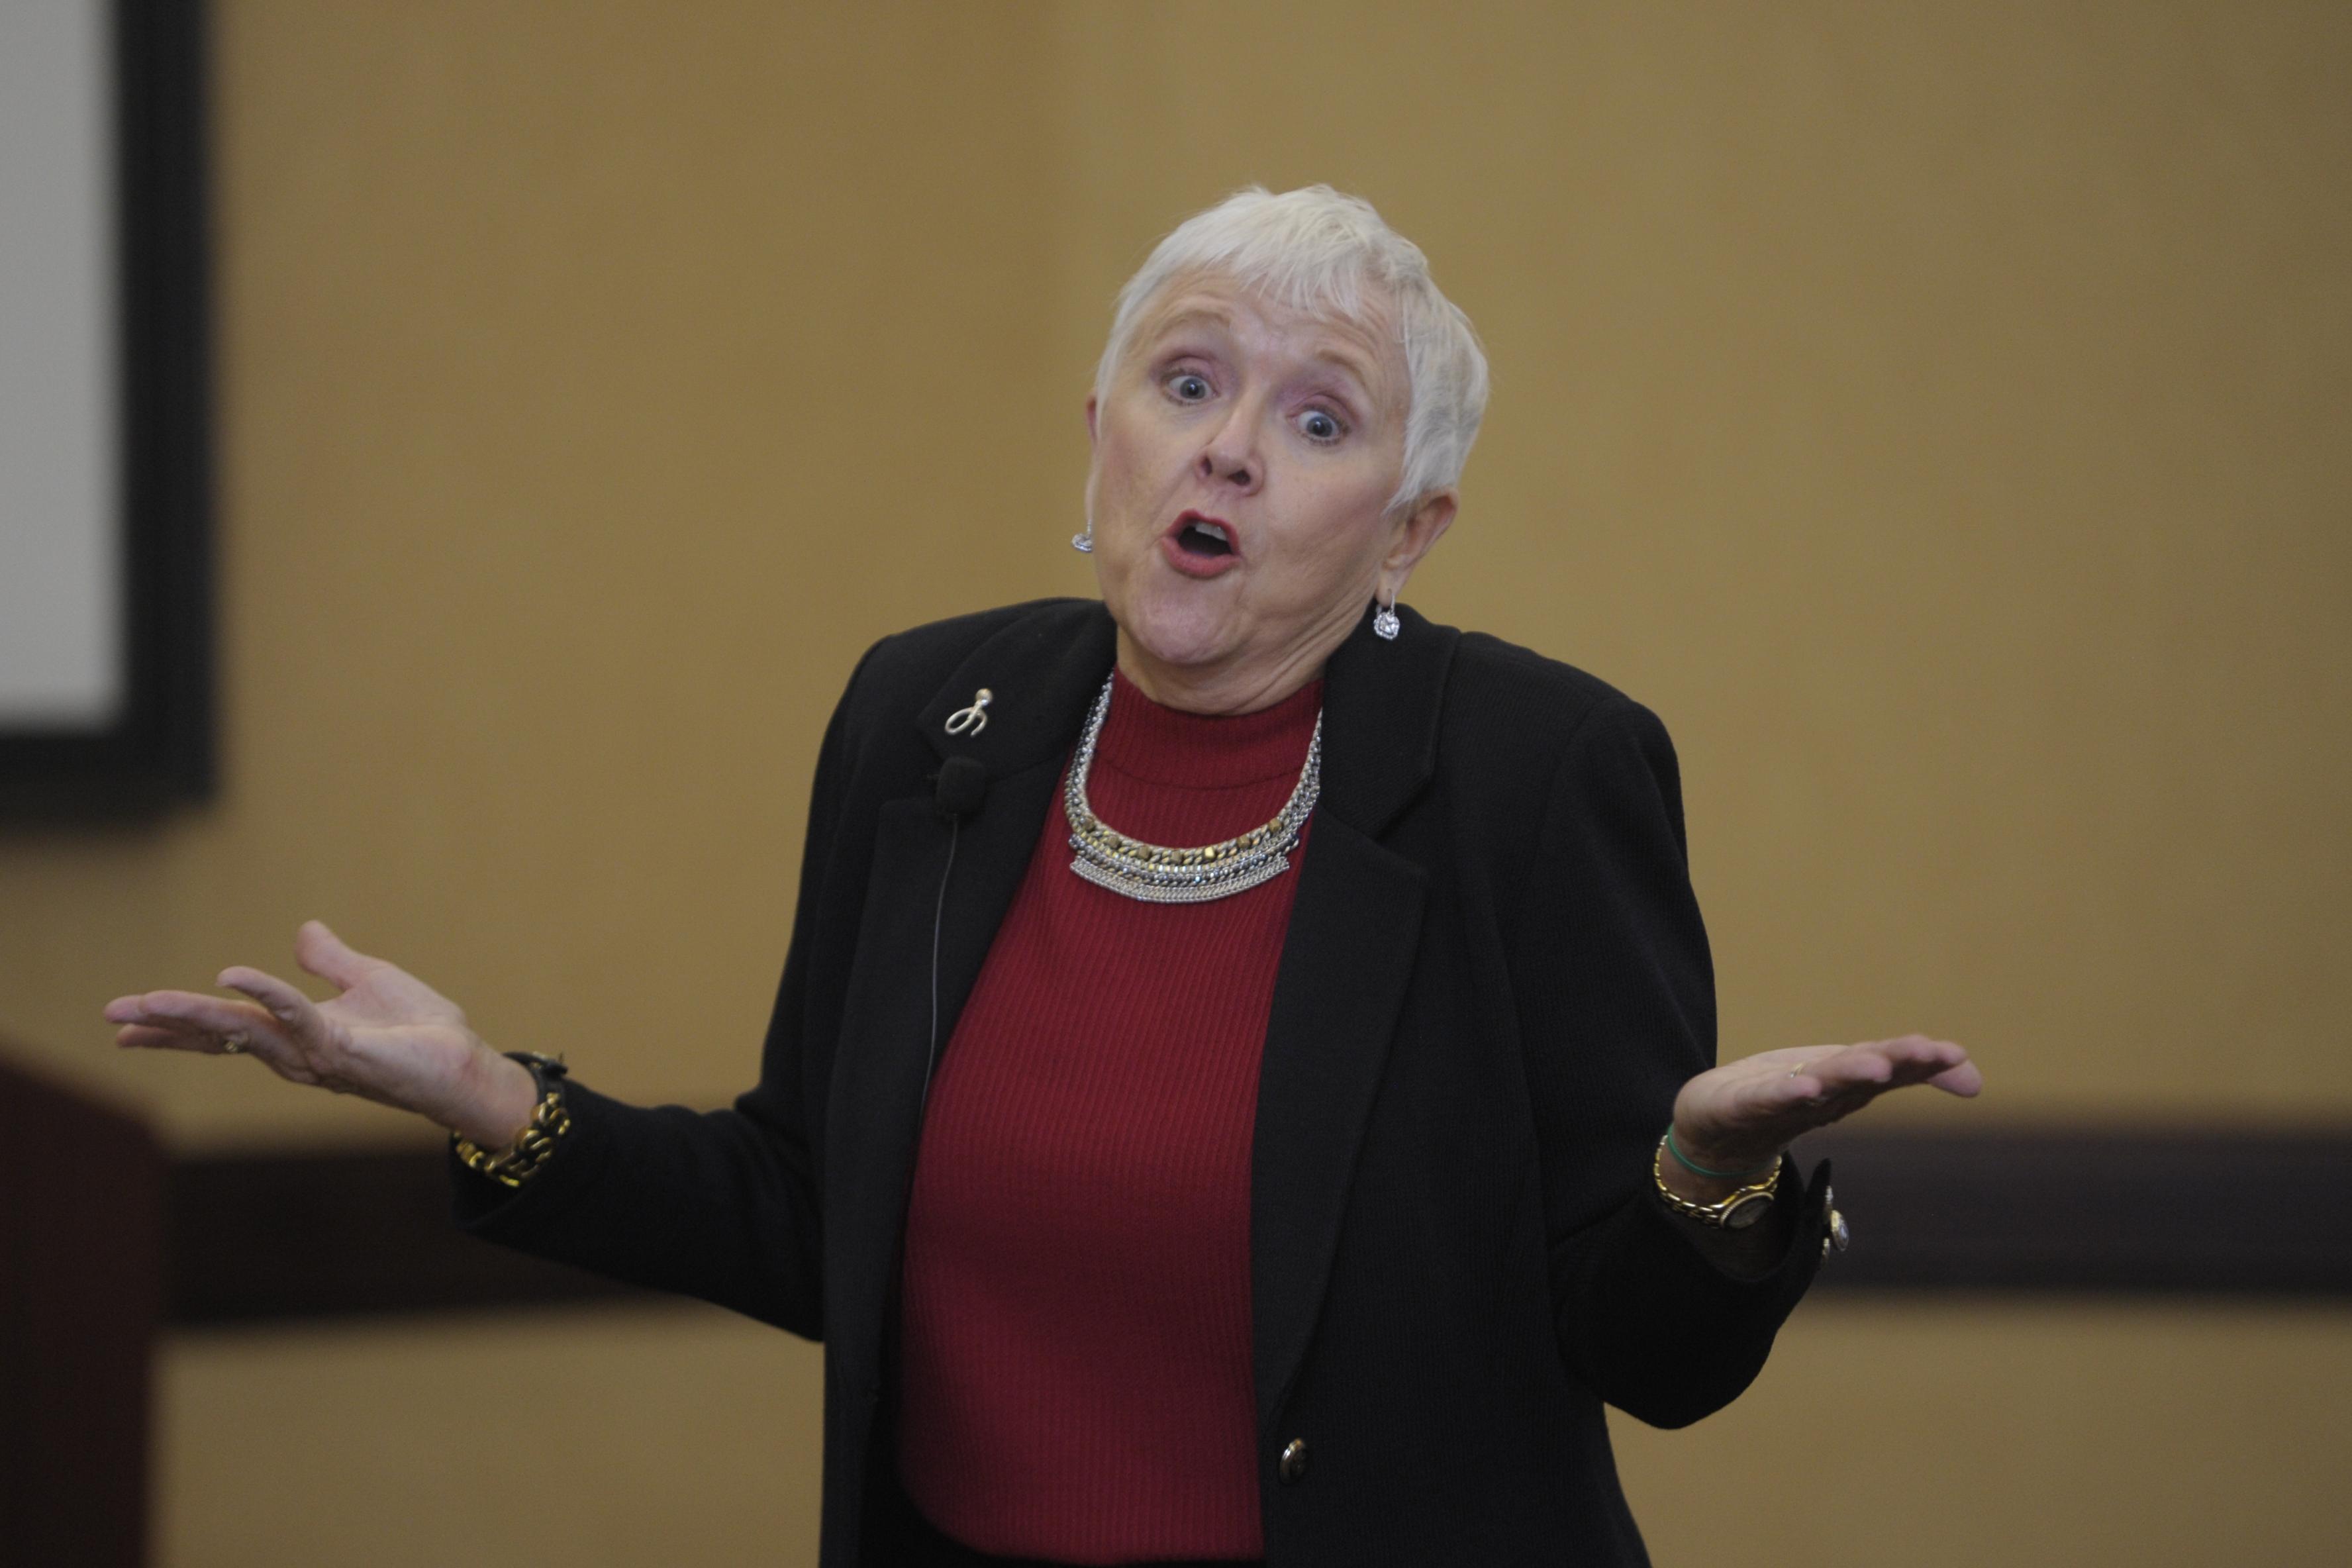 Inspirational Speaker Mary Redmond